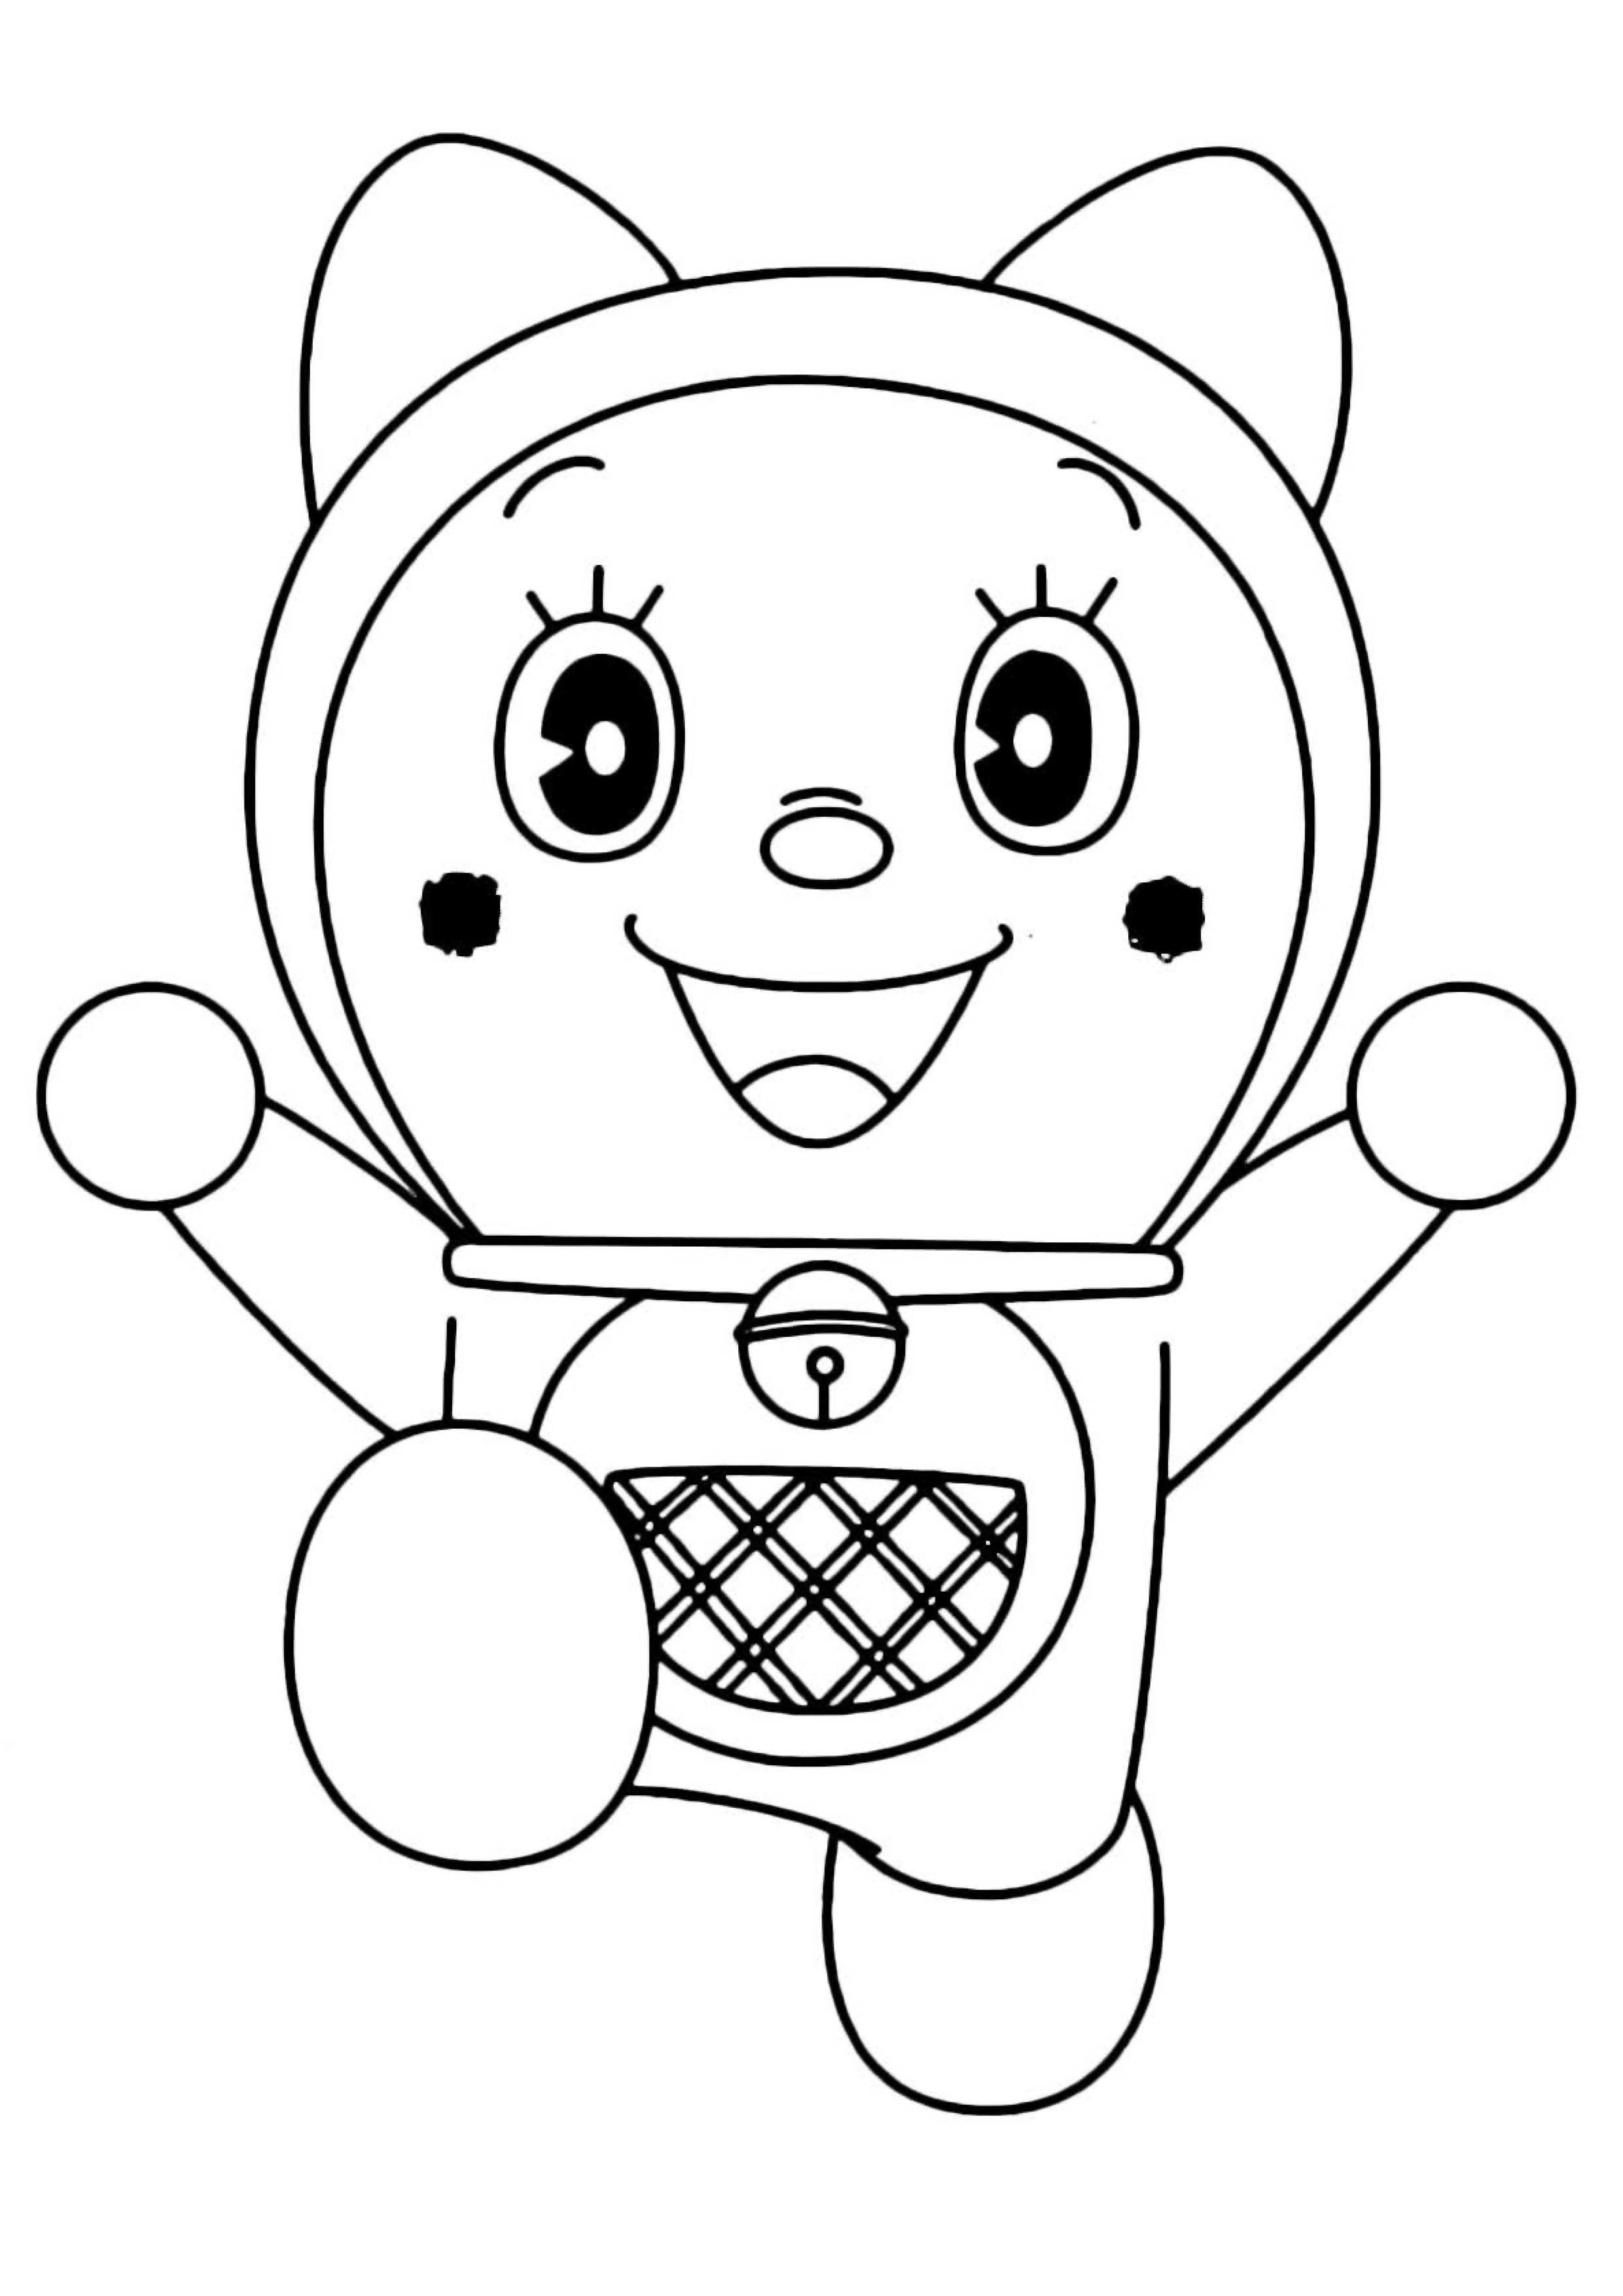 Doraemon-20